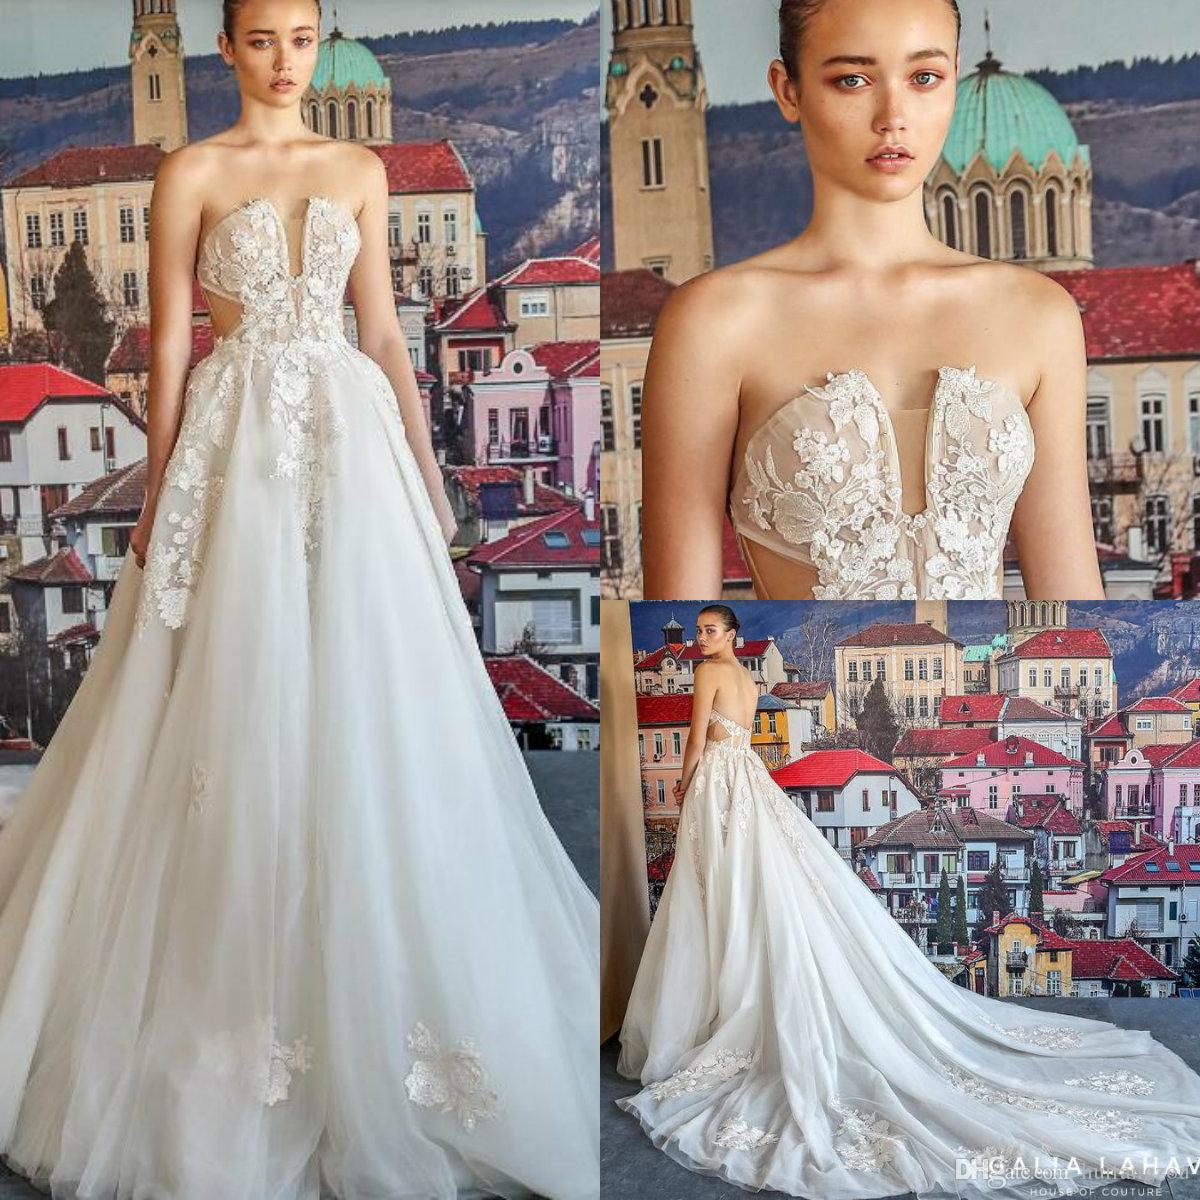 eb7c870b08eda Discount Fancy Strapless Designer Wedding Dresses Sexy Backless Illusion  Exposed Boning Tulle Bridal Gowns Custom Made Plus Size Vestidos De Noiva  Tea ...